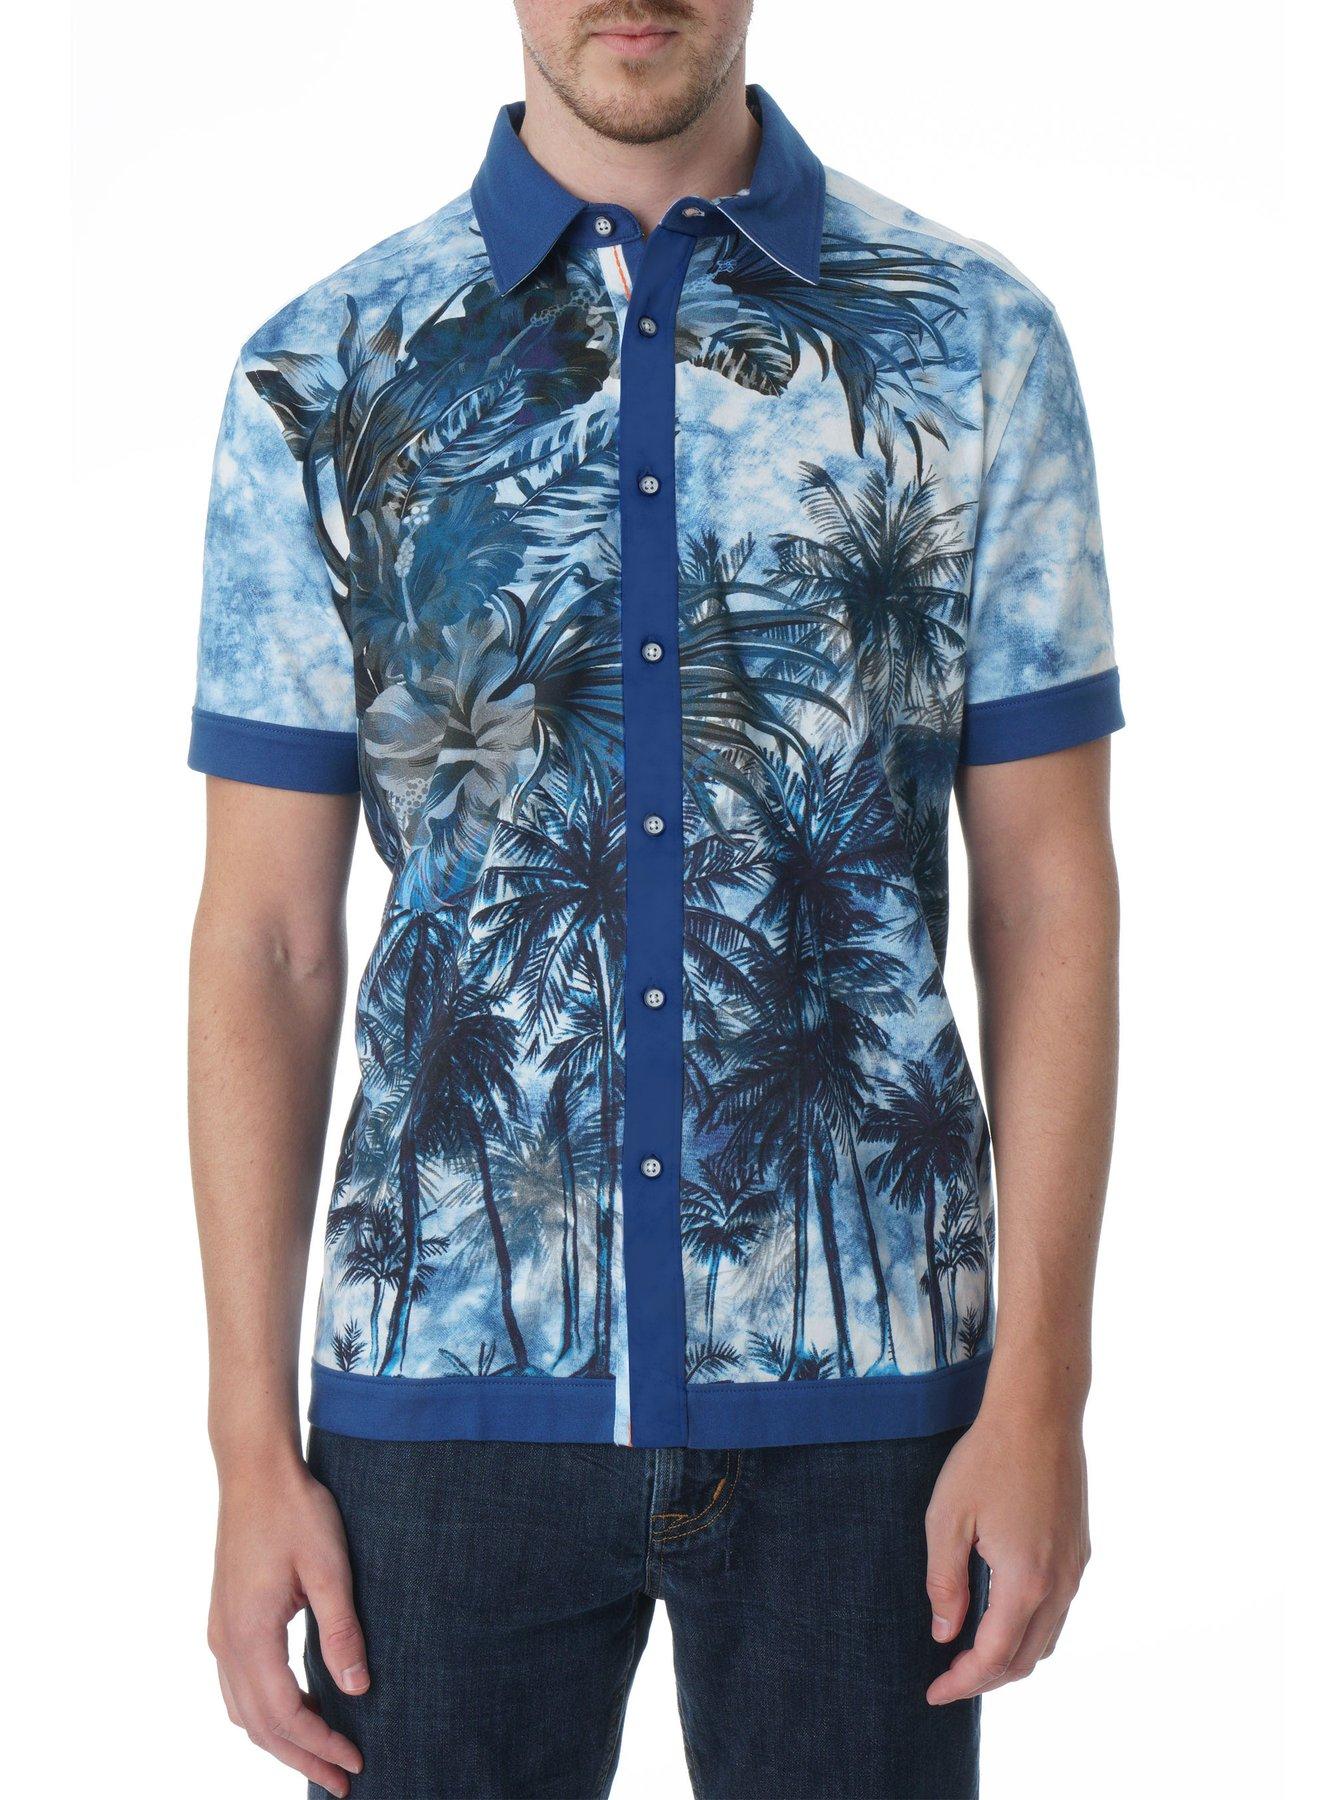 Robert Graham Cantana Short Sleeve Knit Shirt Multi